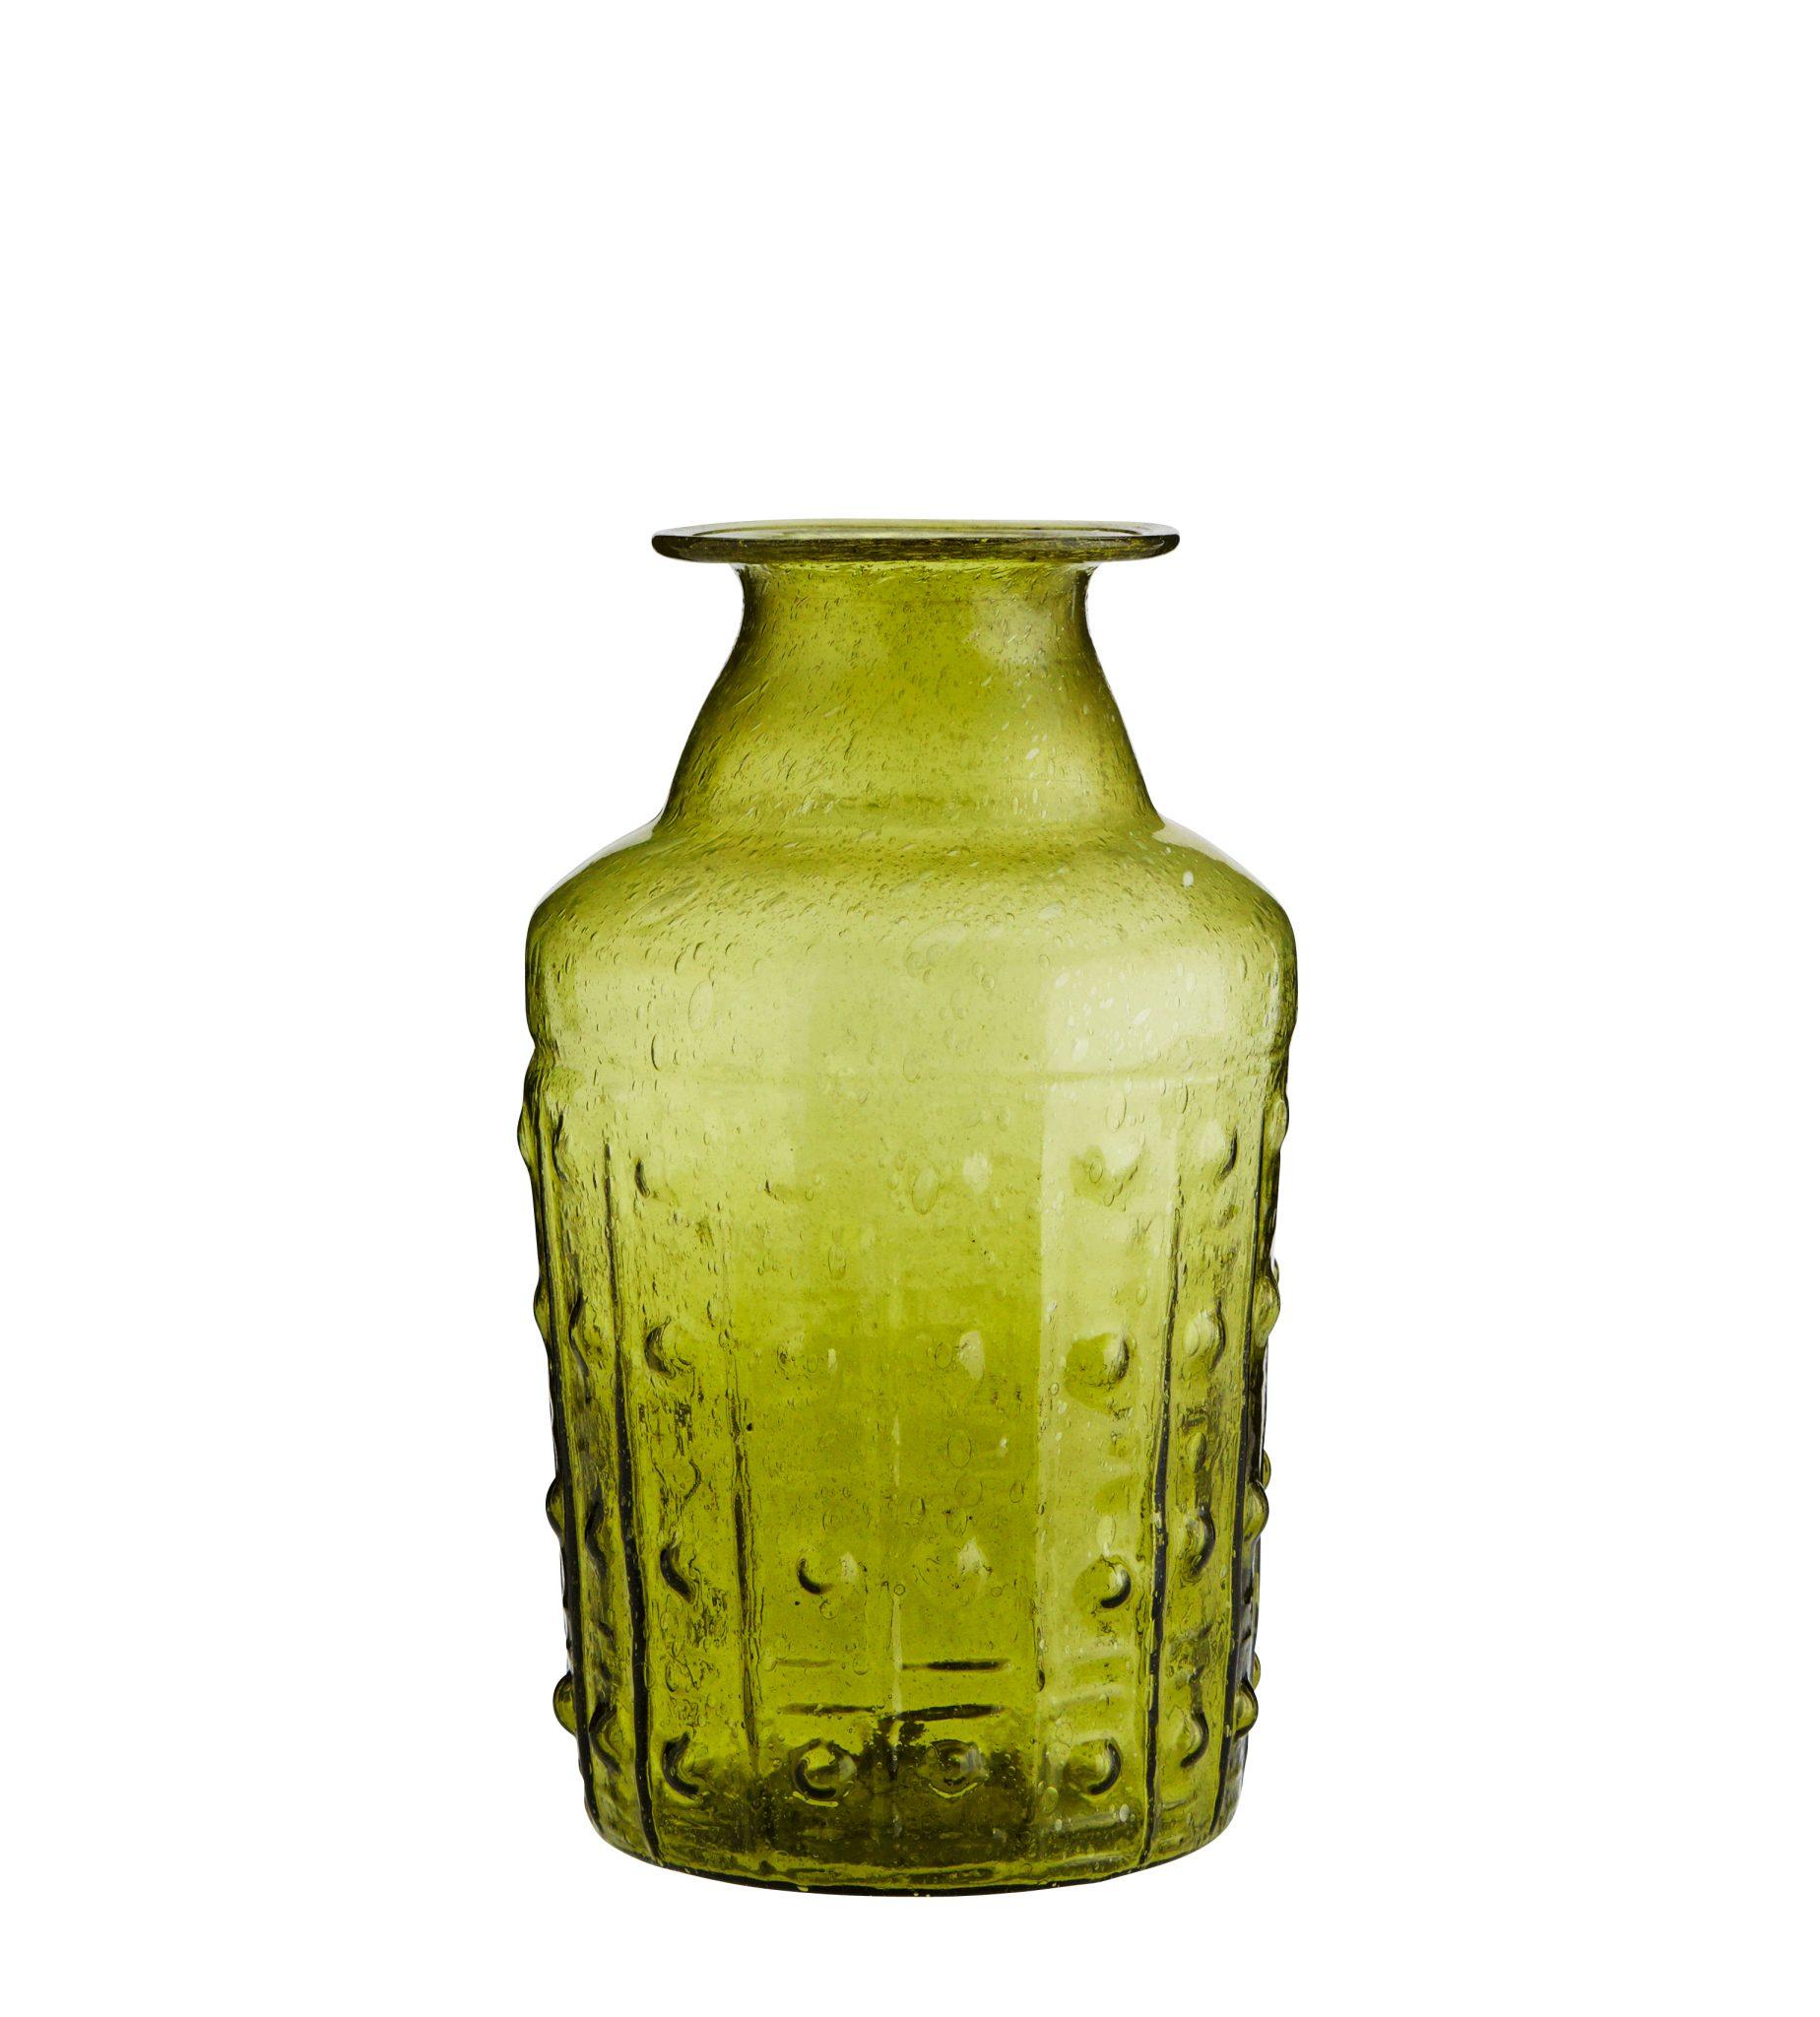 gro e vase aus recyclingglas popshop skandinavische. Black Bedroom Furniture Sets. Home Design Ideas